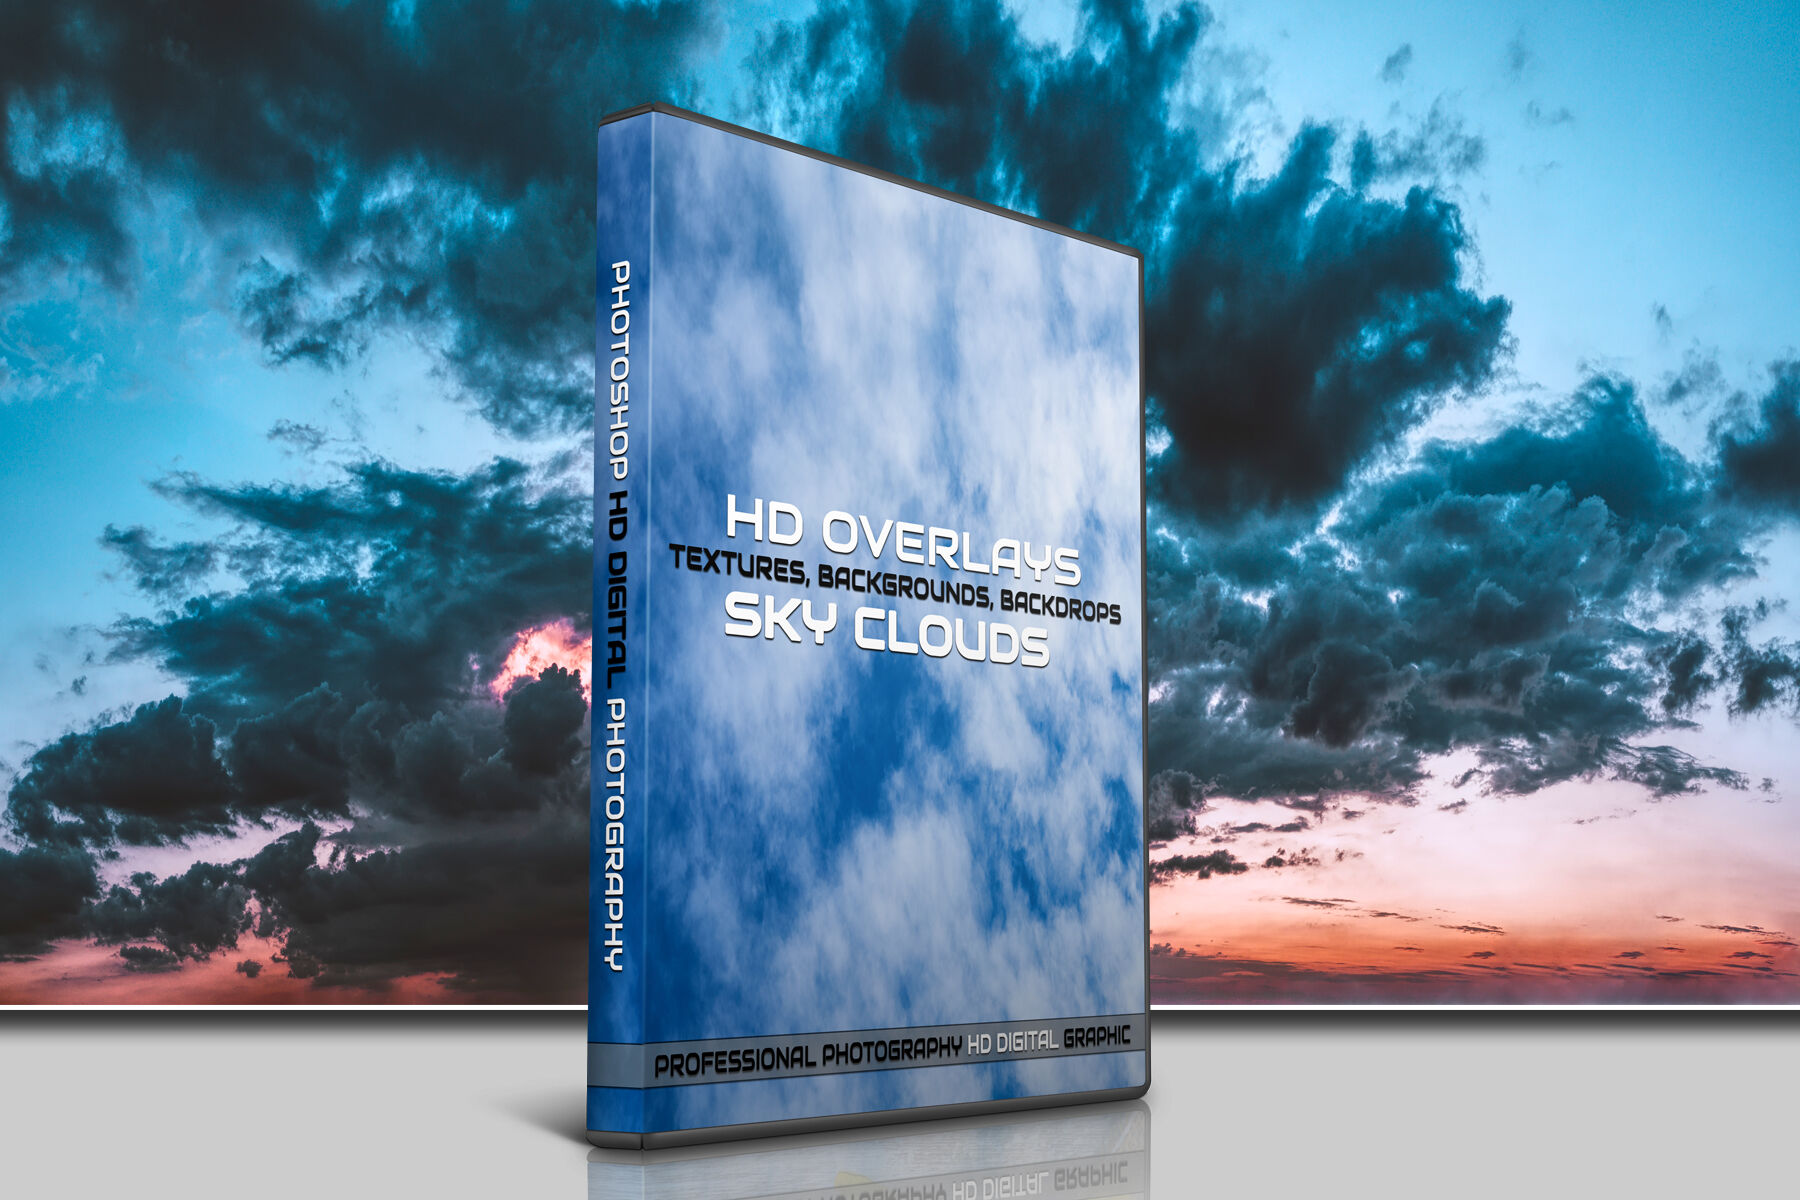 200 High Quality Sky Clouds Digital Photoshop Overlays By Digital